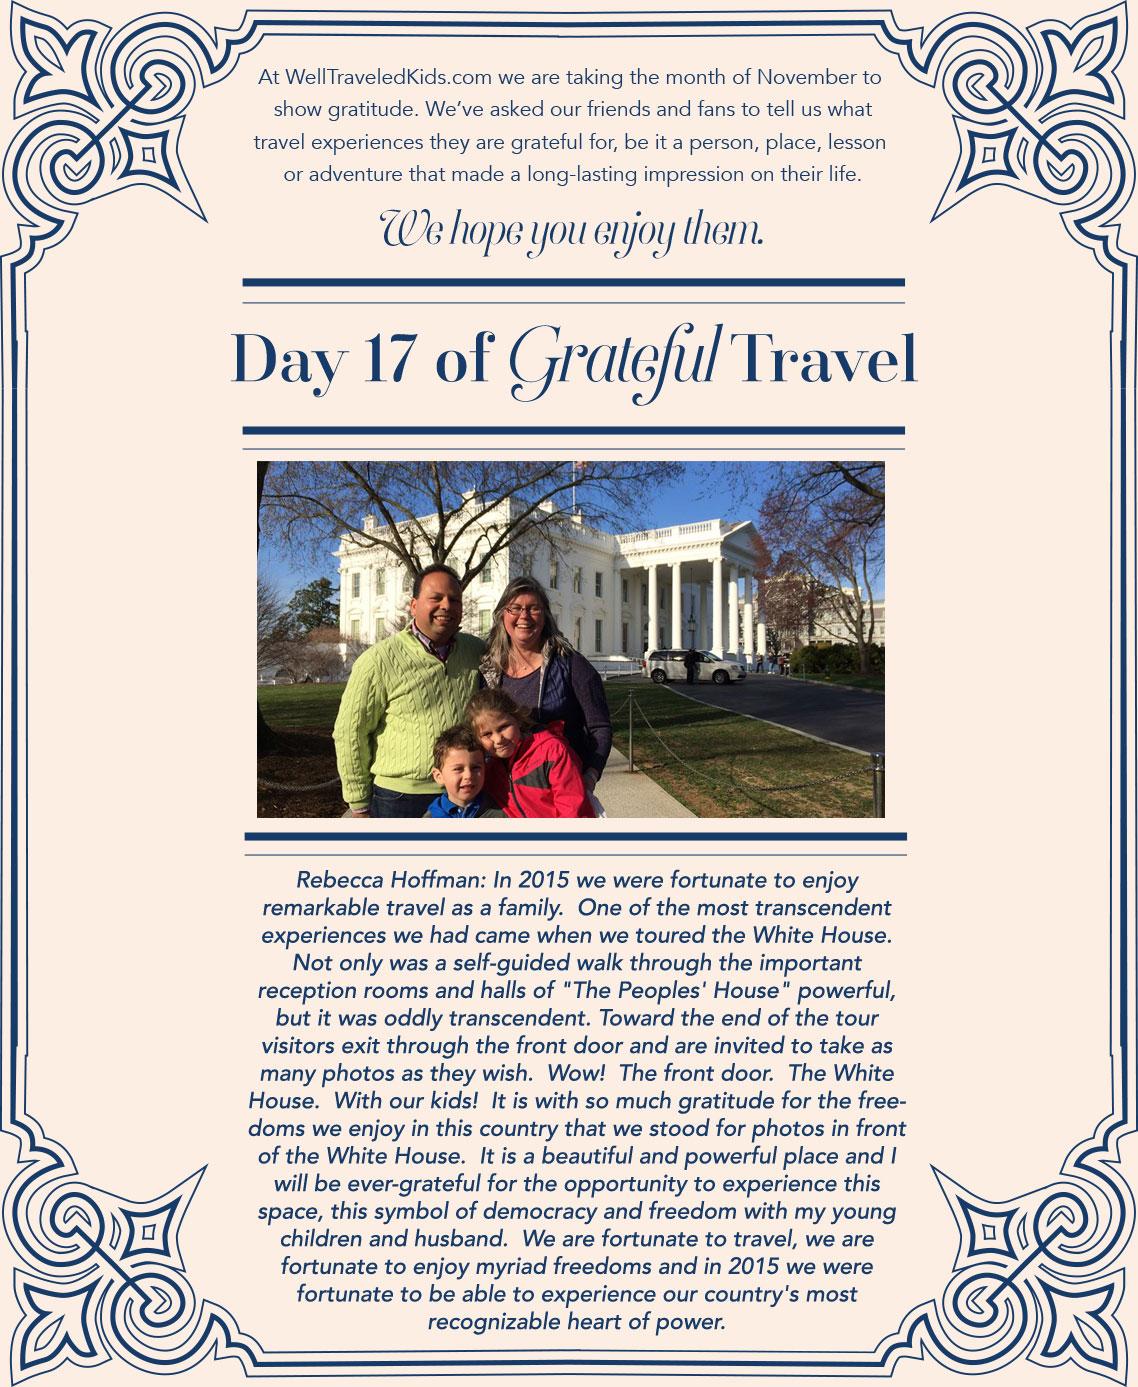 Day17_RebeccaHoffman